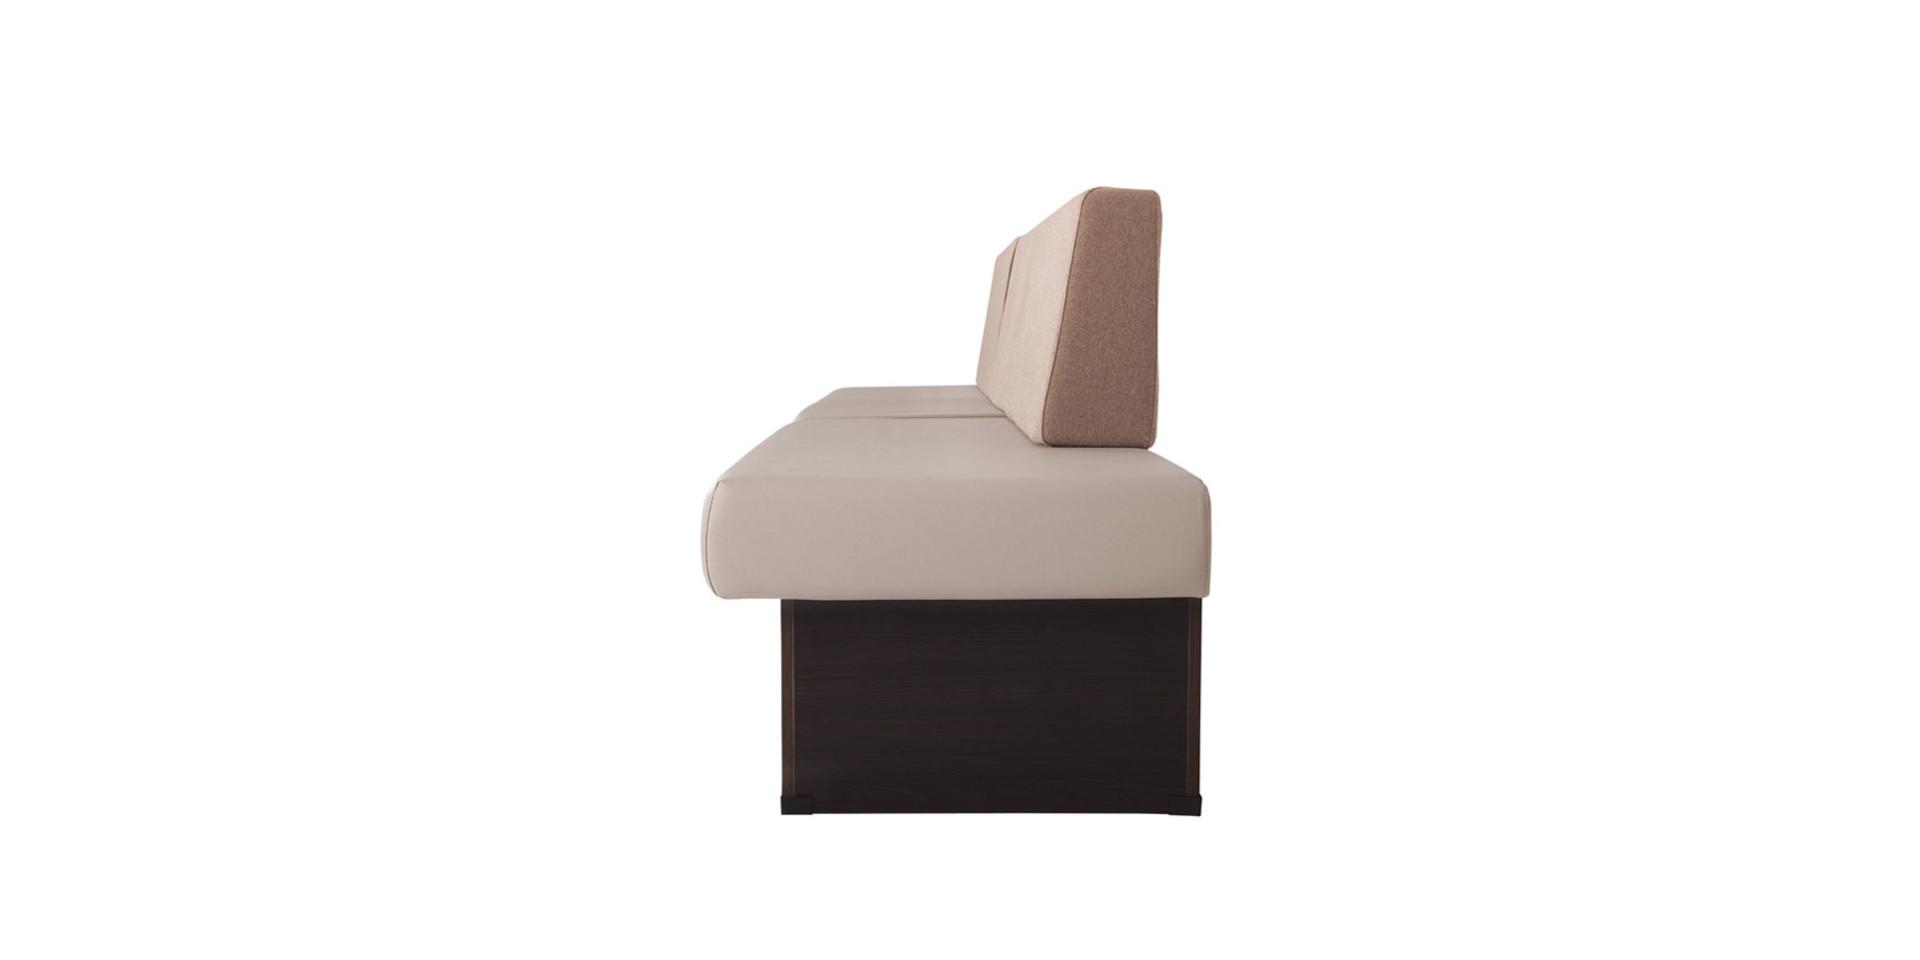 sits-hedda-angle-elements_panno1026_light_brown_sixty13_sahara_3